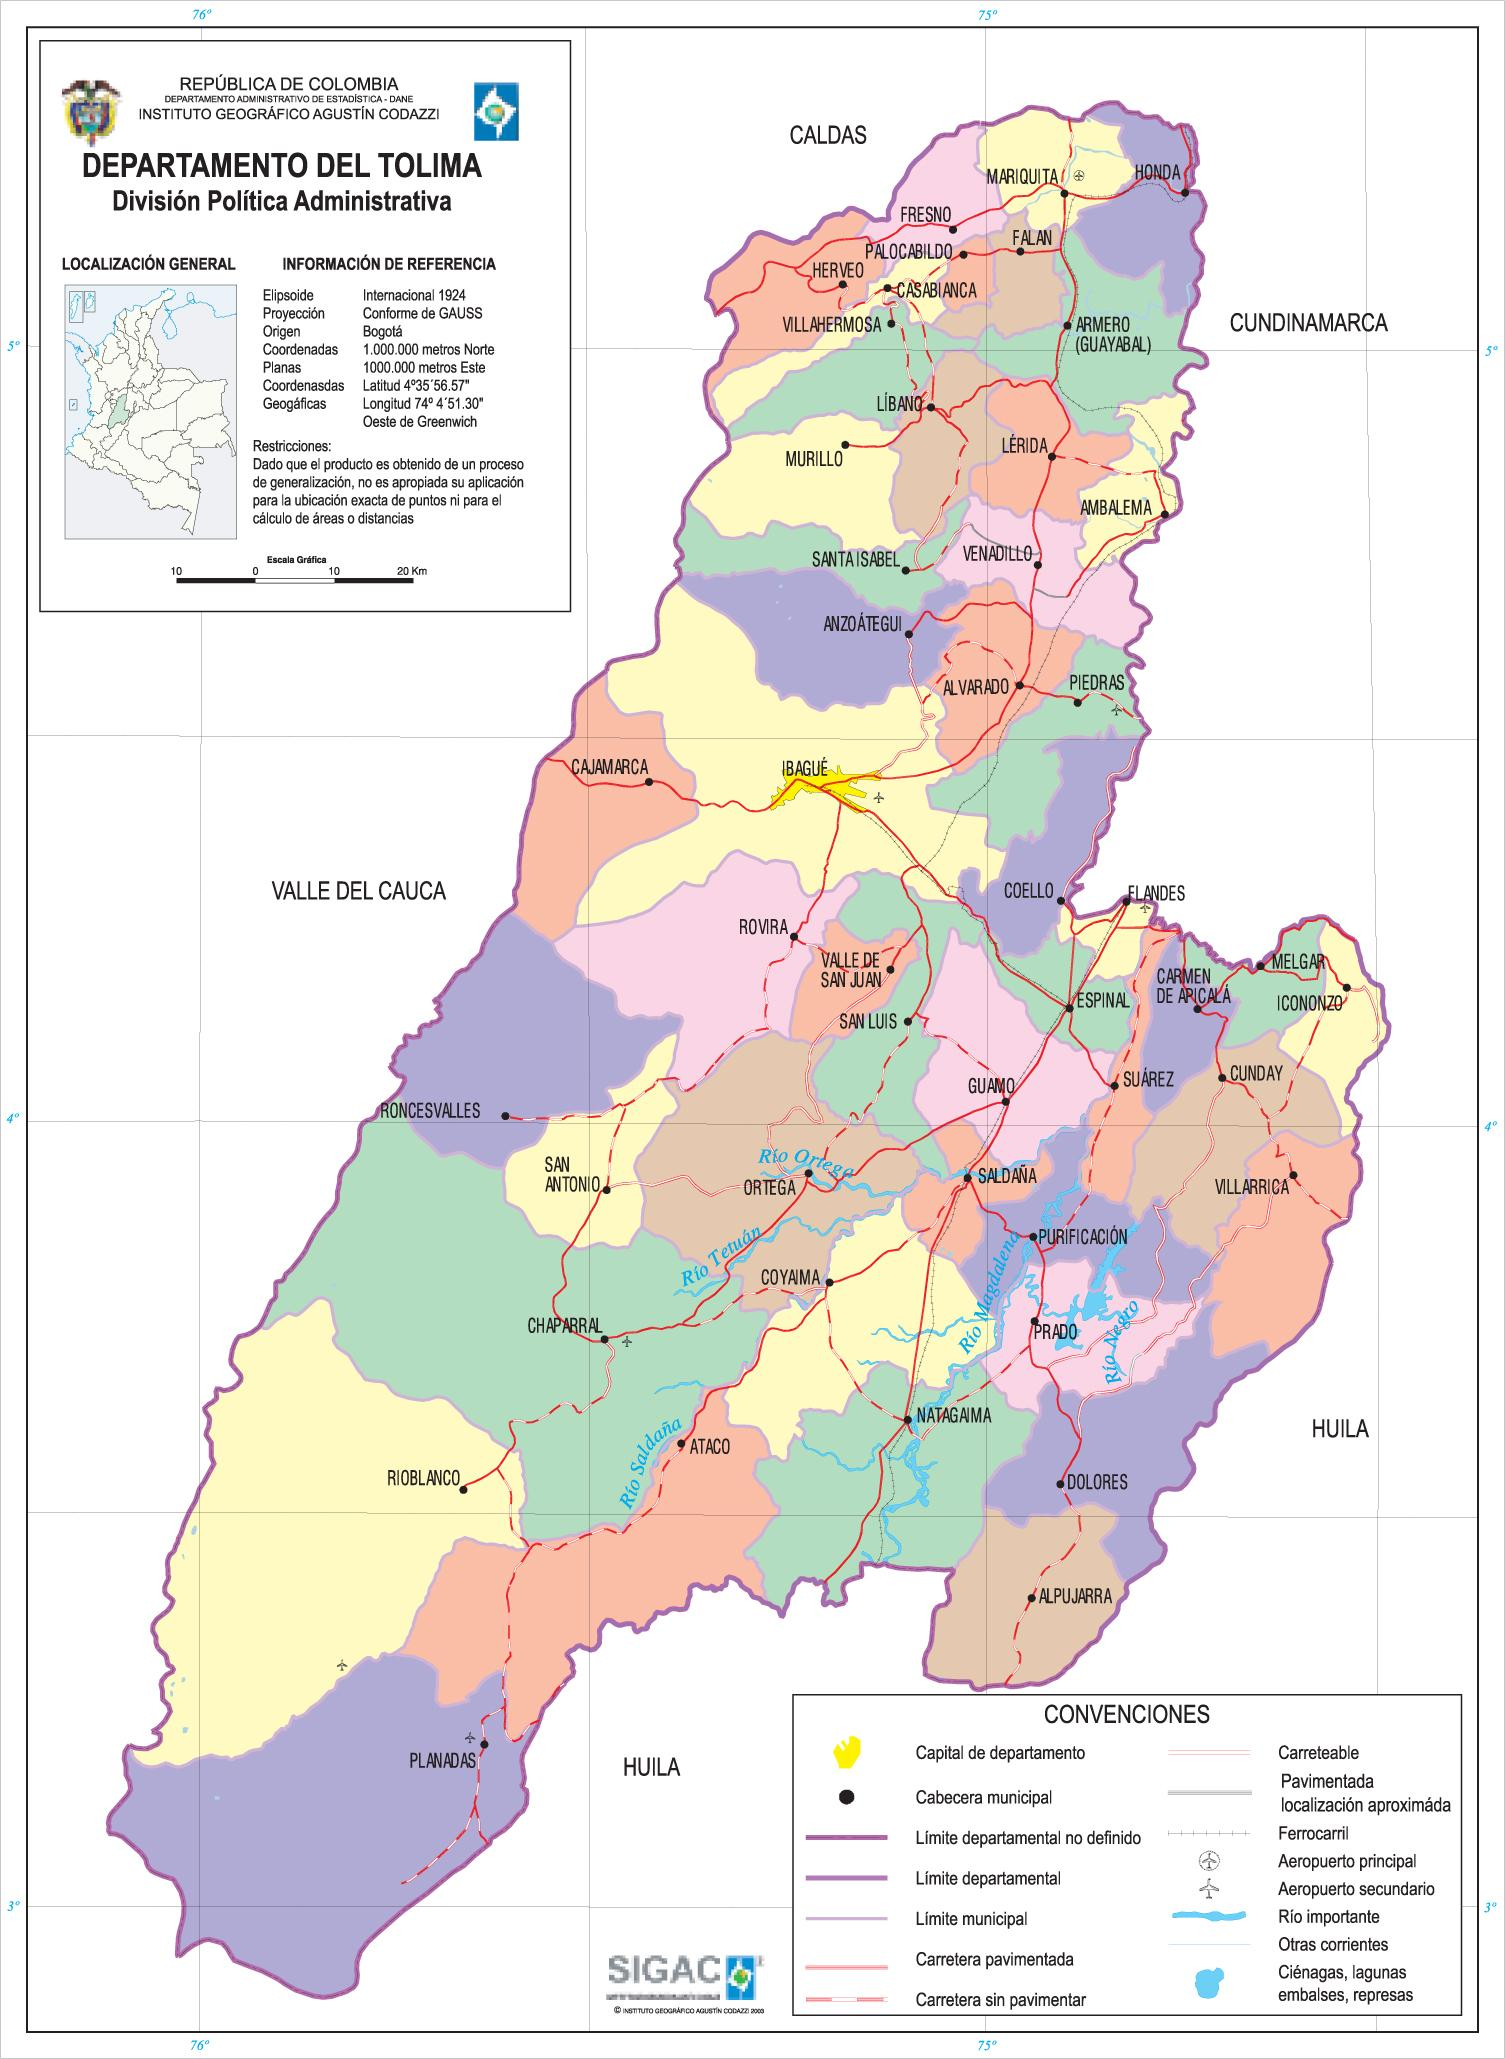 Filemapa Del Departamento Del Tolima Colombia Jpg